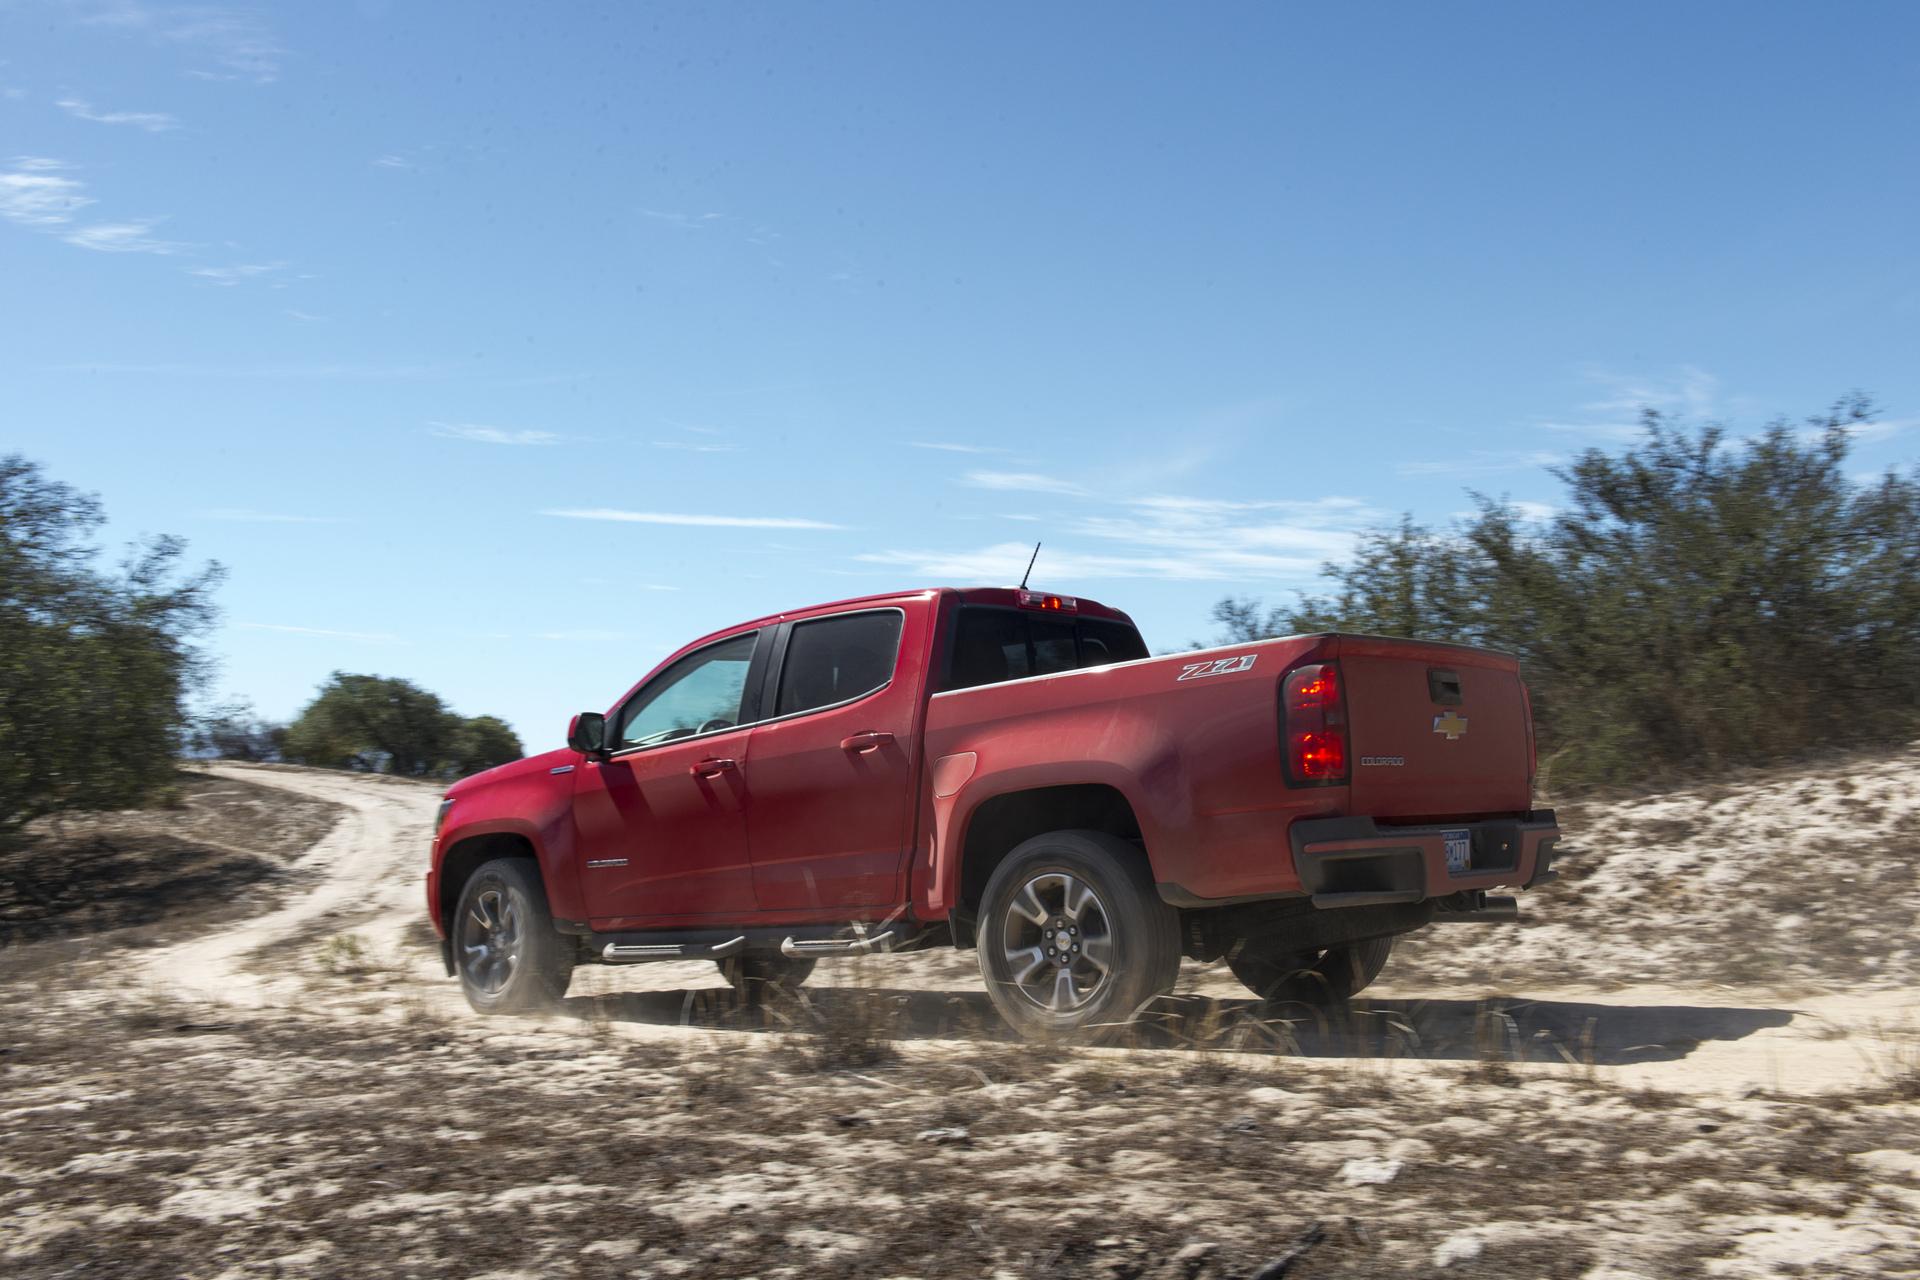 2016 Chevrolet Colorado Diesel © General Motors